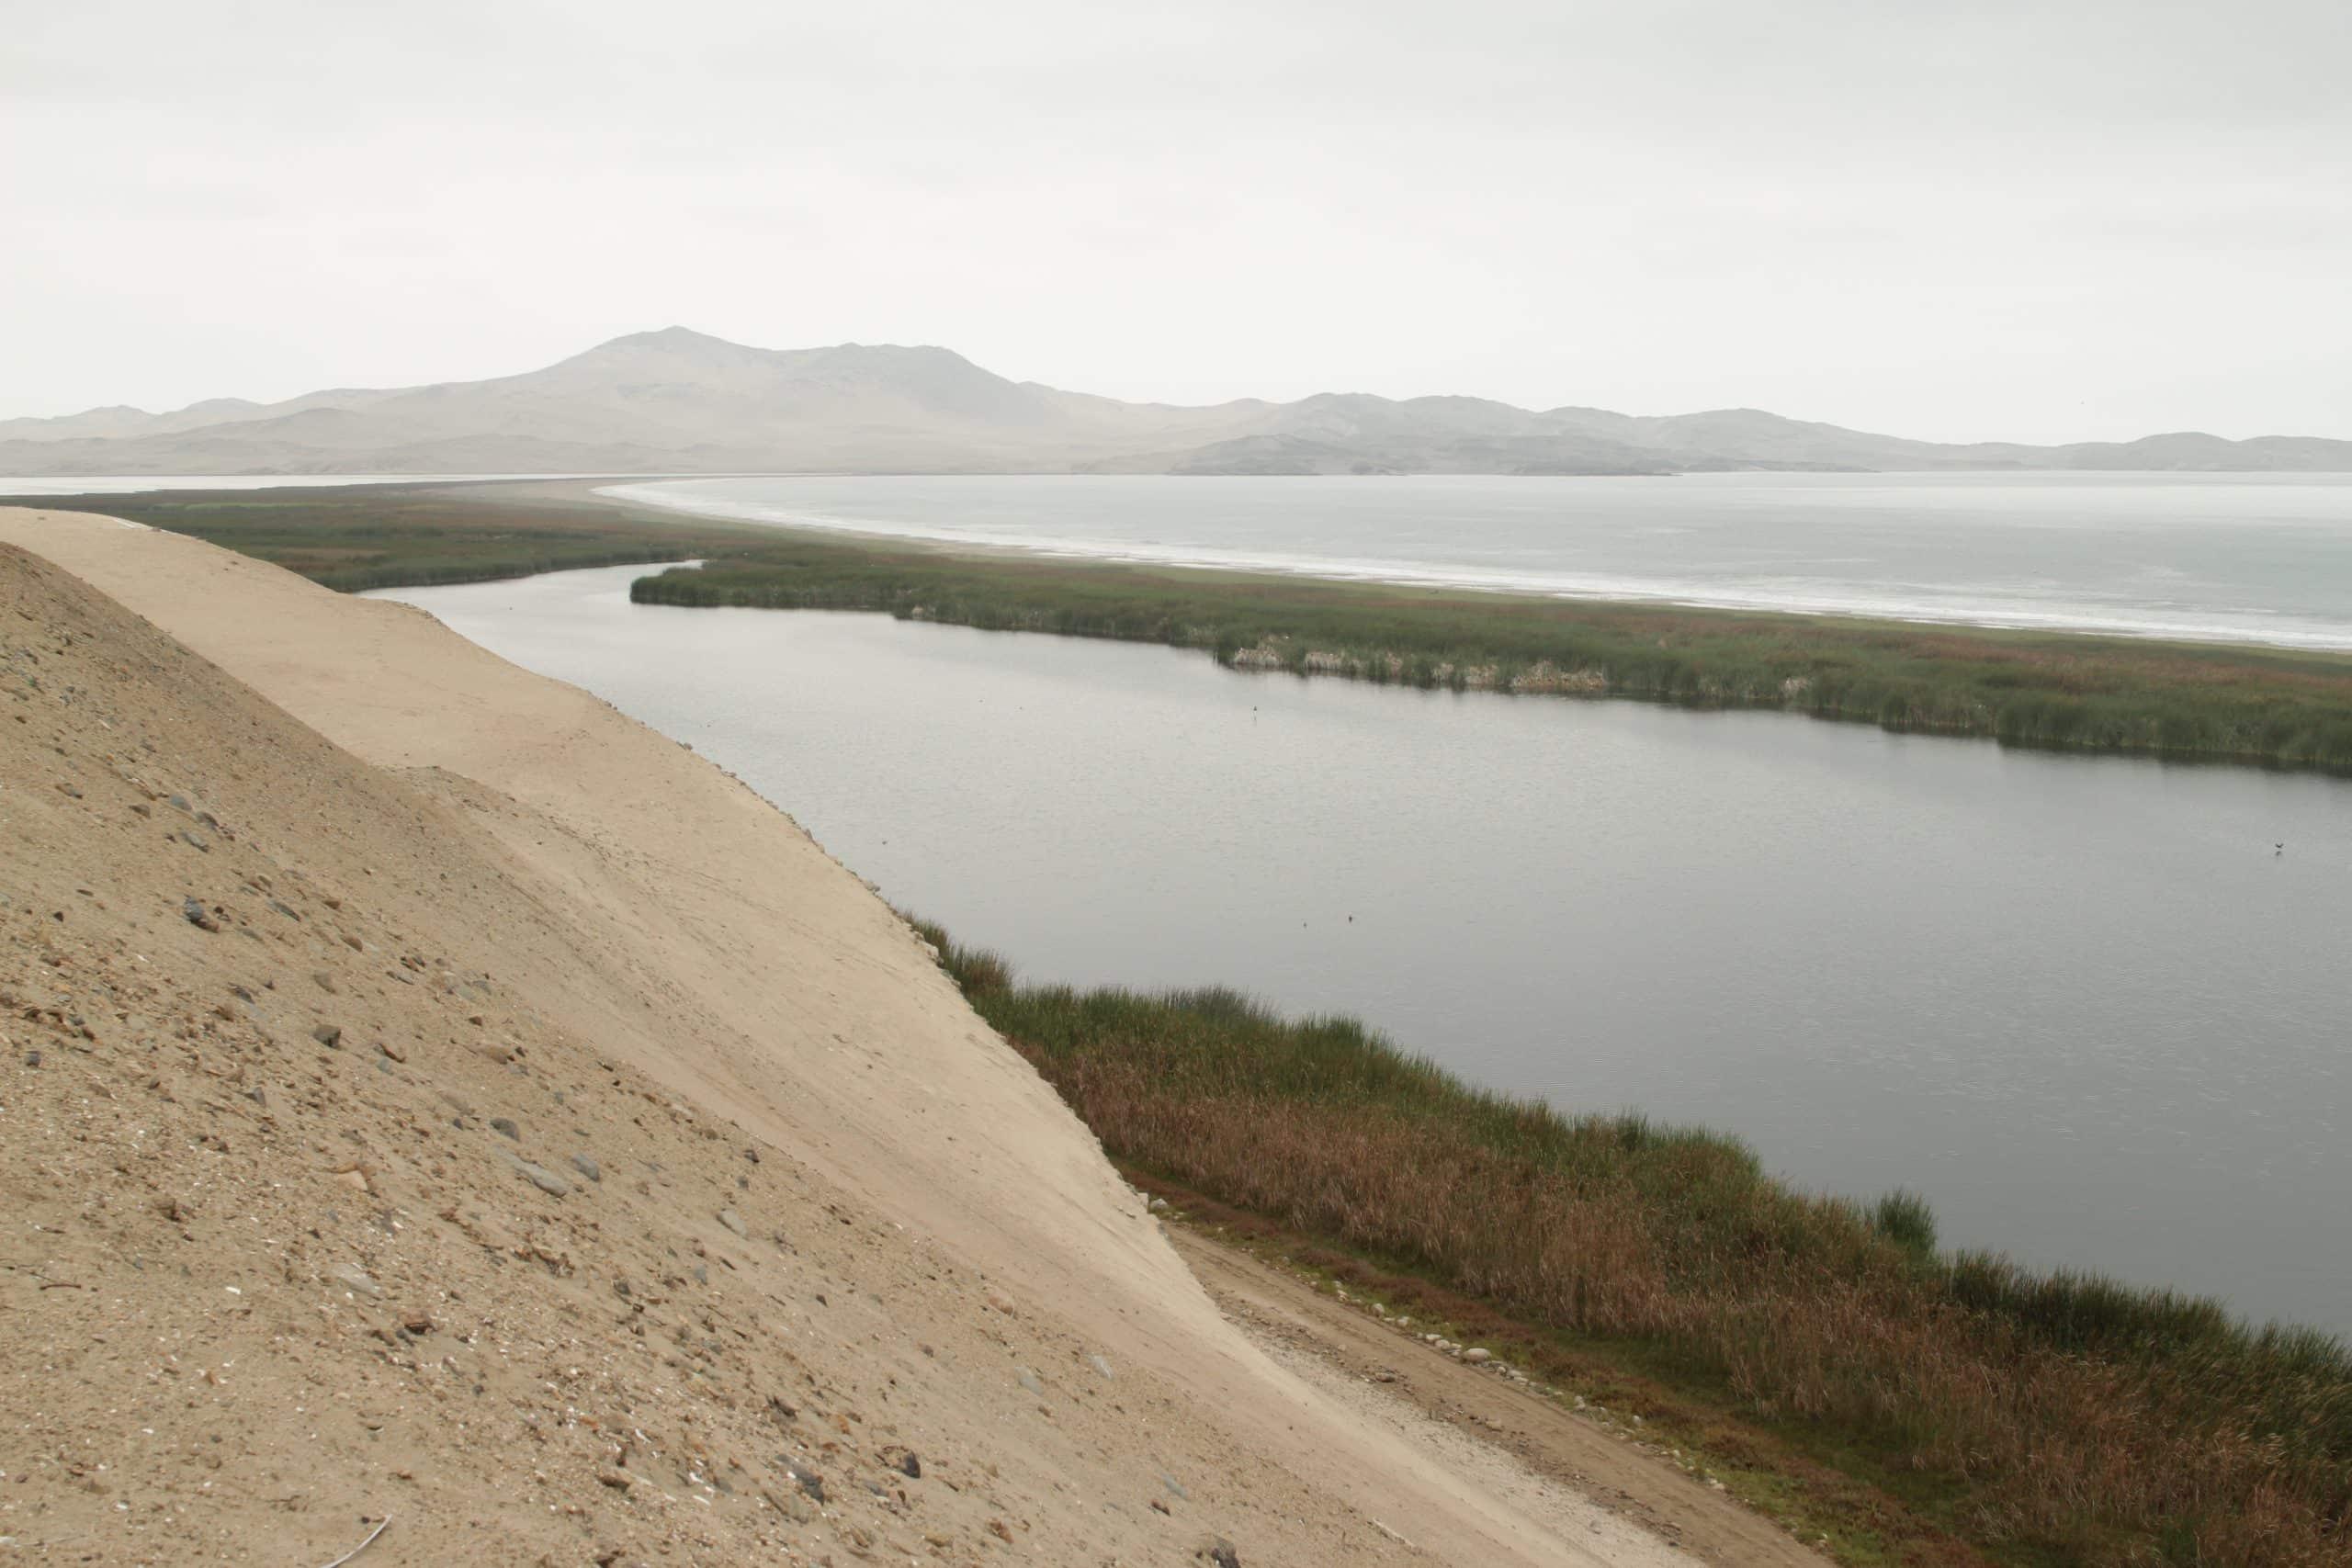 Paisaje del desierto: Albufera de Medio Mundo (Lima, Perú). Desert landscape: Albufera de Medio Mundo (Lima, Perú).